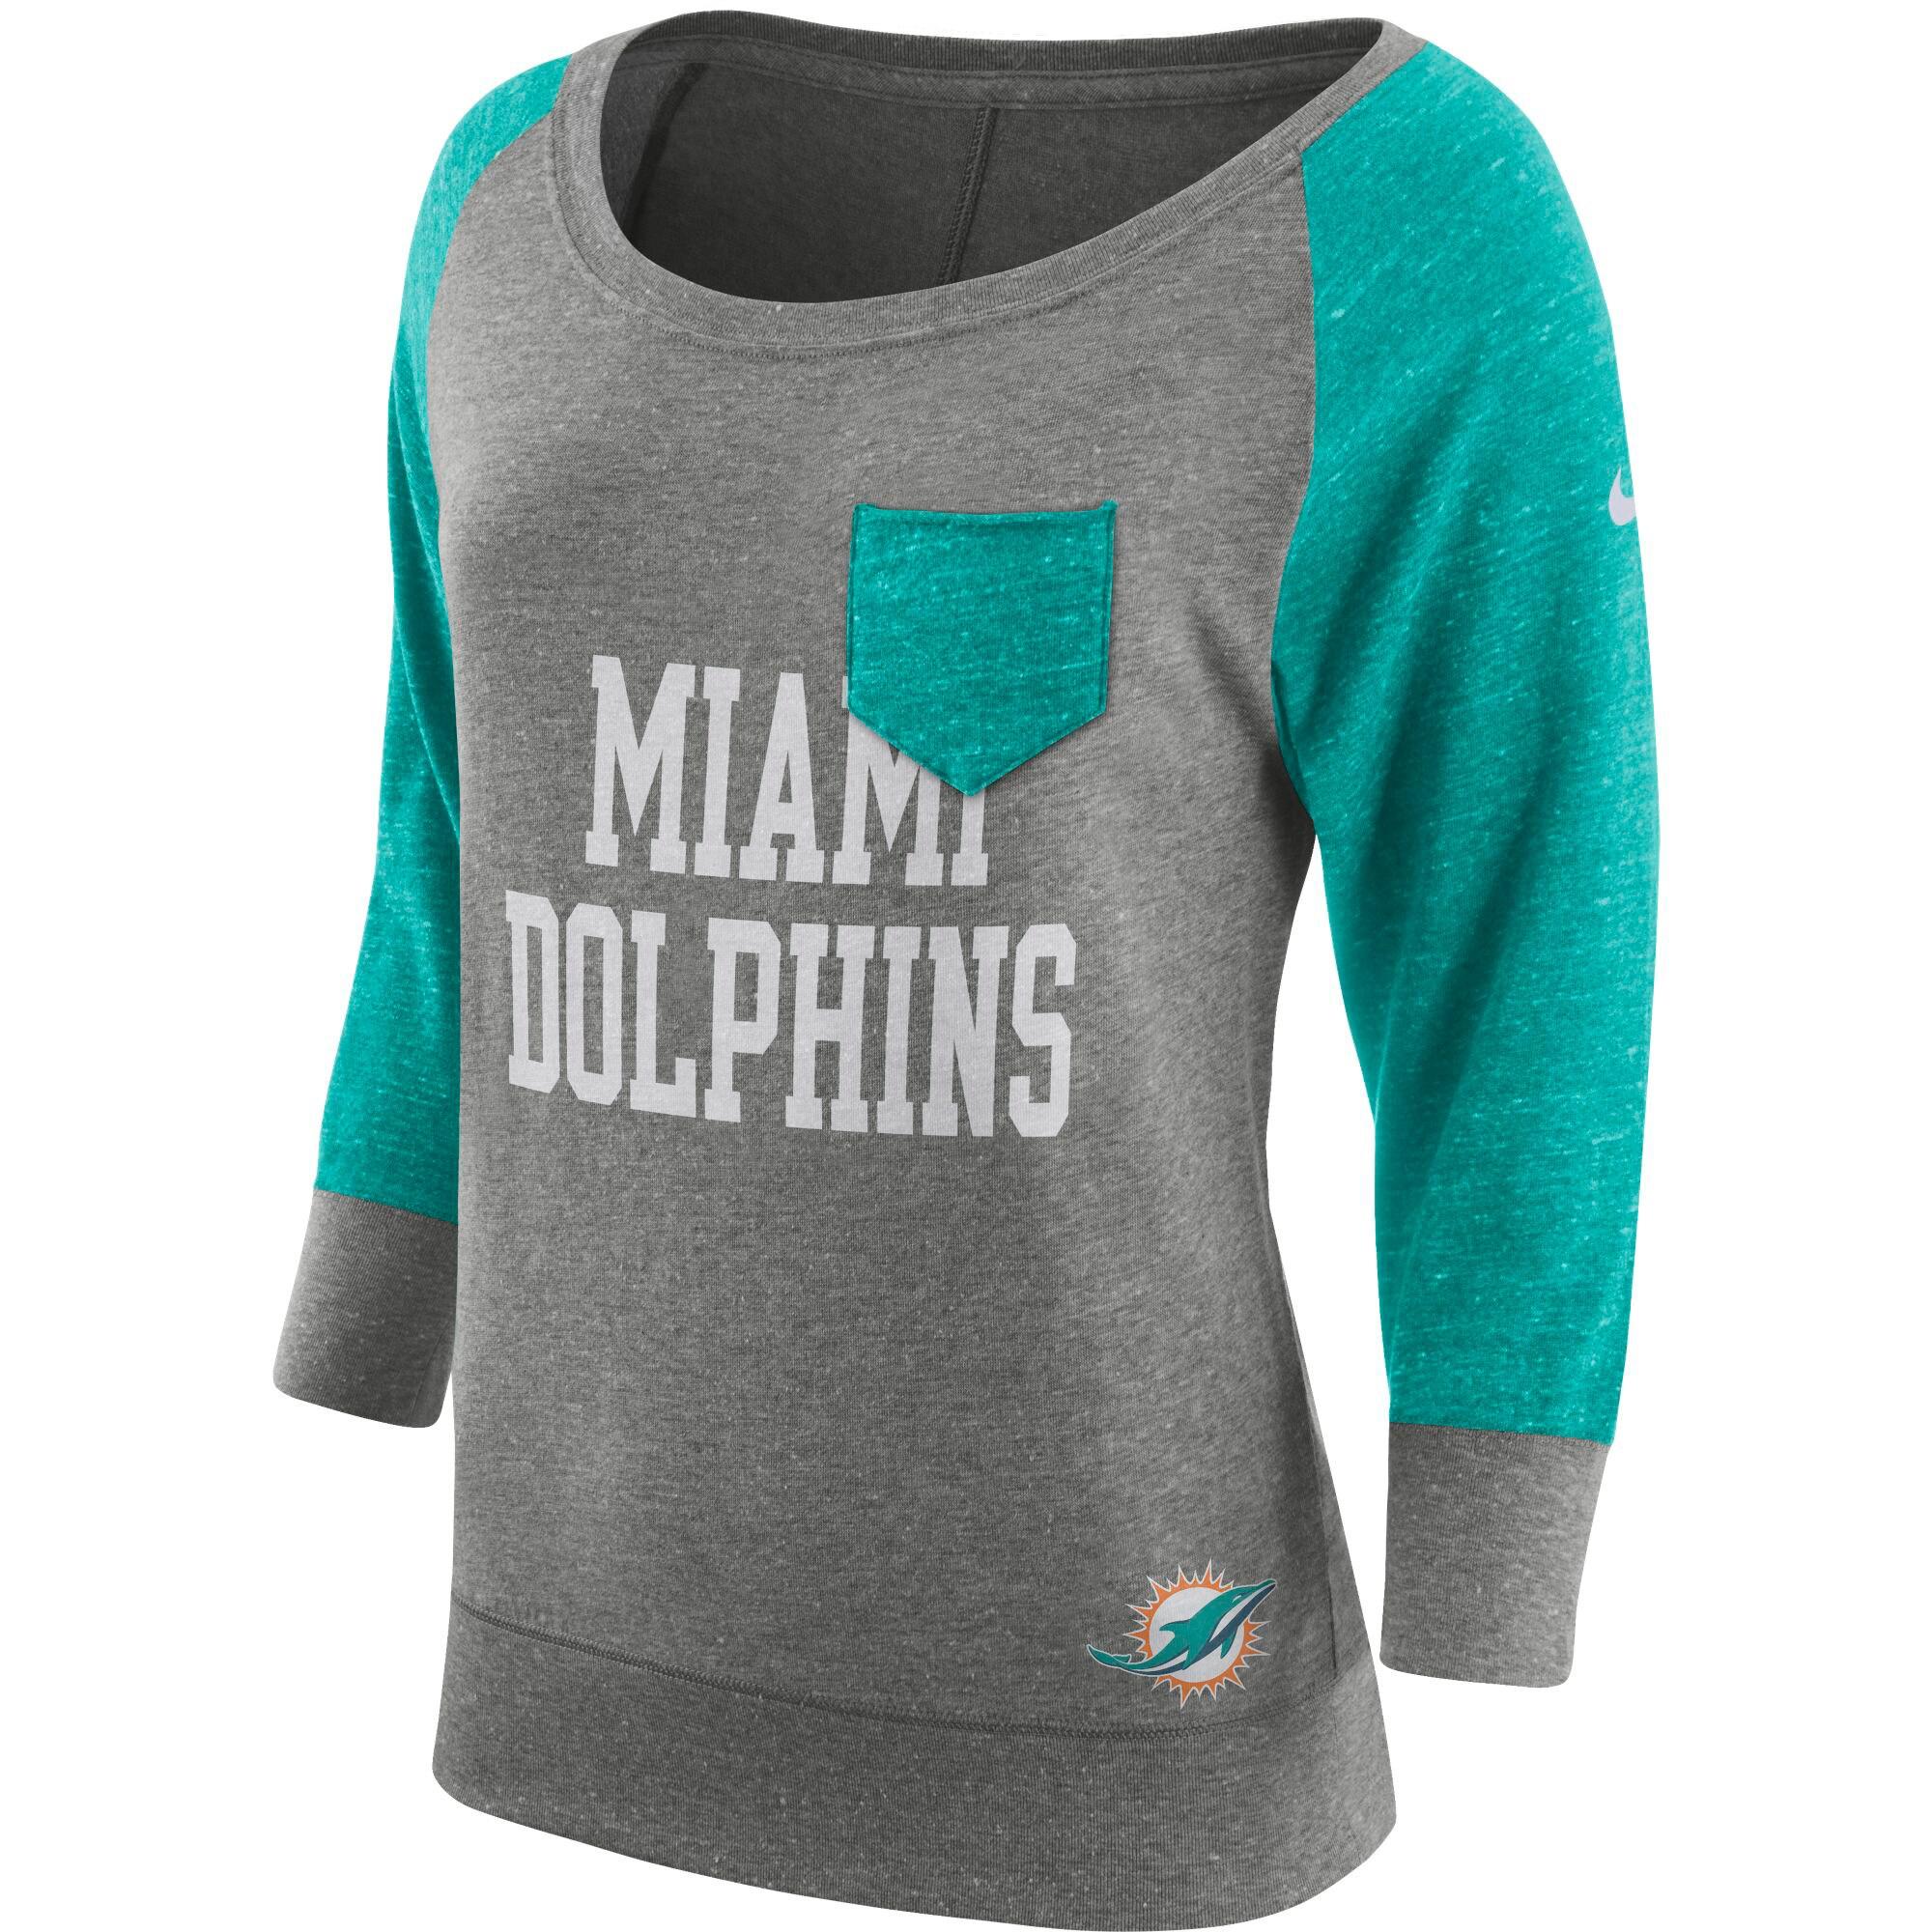 Miami Dolphins Nike Women's Tailgate Vintage Raglan 3/4-Sleeve T-Shirt - Heathered Gray/Aqua